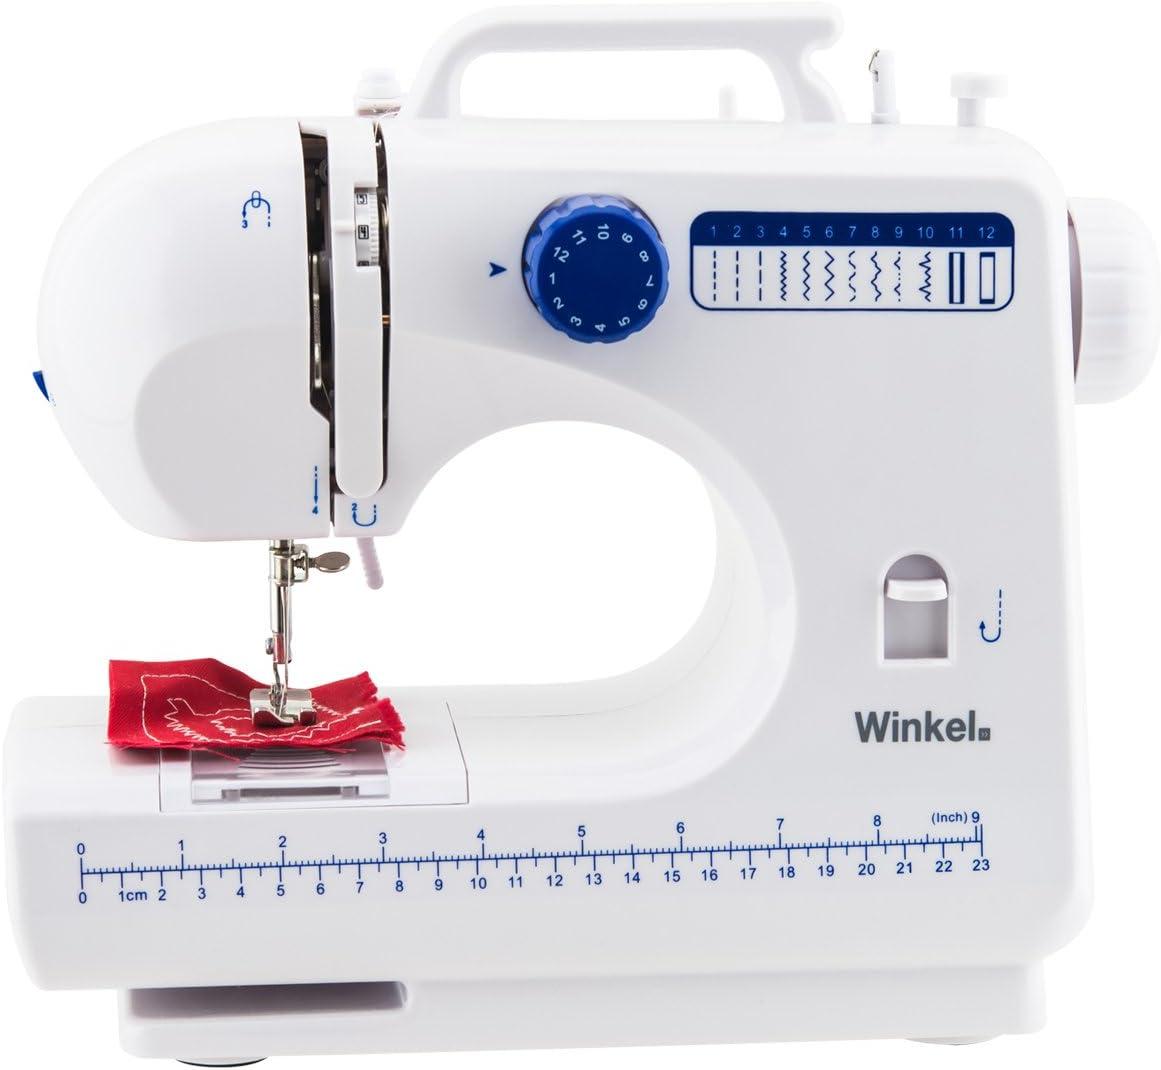 WINKEL SW45 Máquina de Coser mecánica, 12 Puntadas, con LED para iluminar, Blanco y Azul, 30x11x26 cm, Algodón, 30 X 11 X 26 Cm